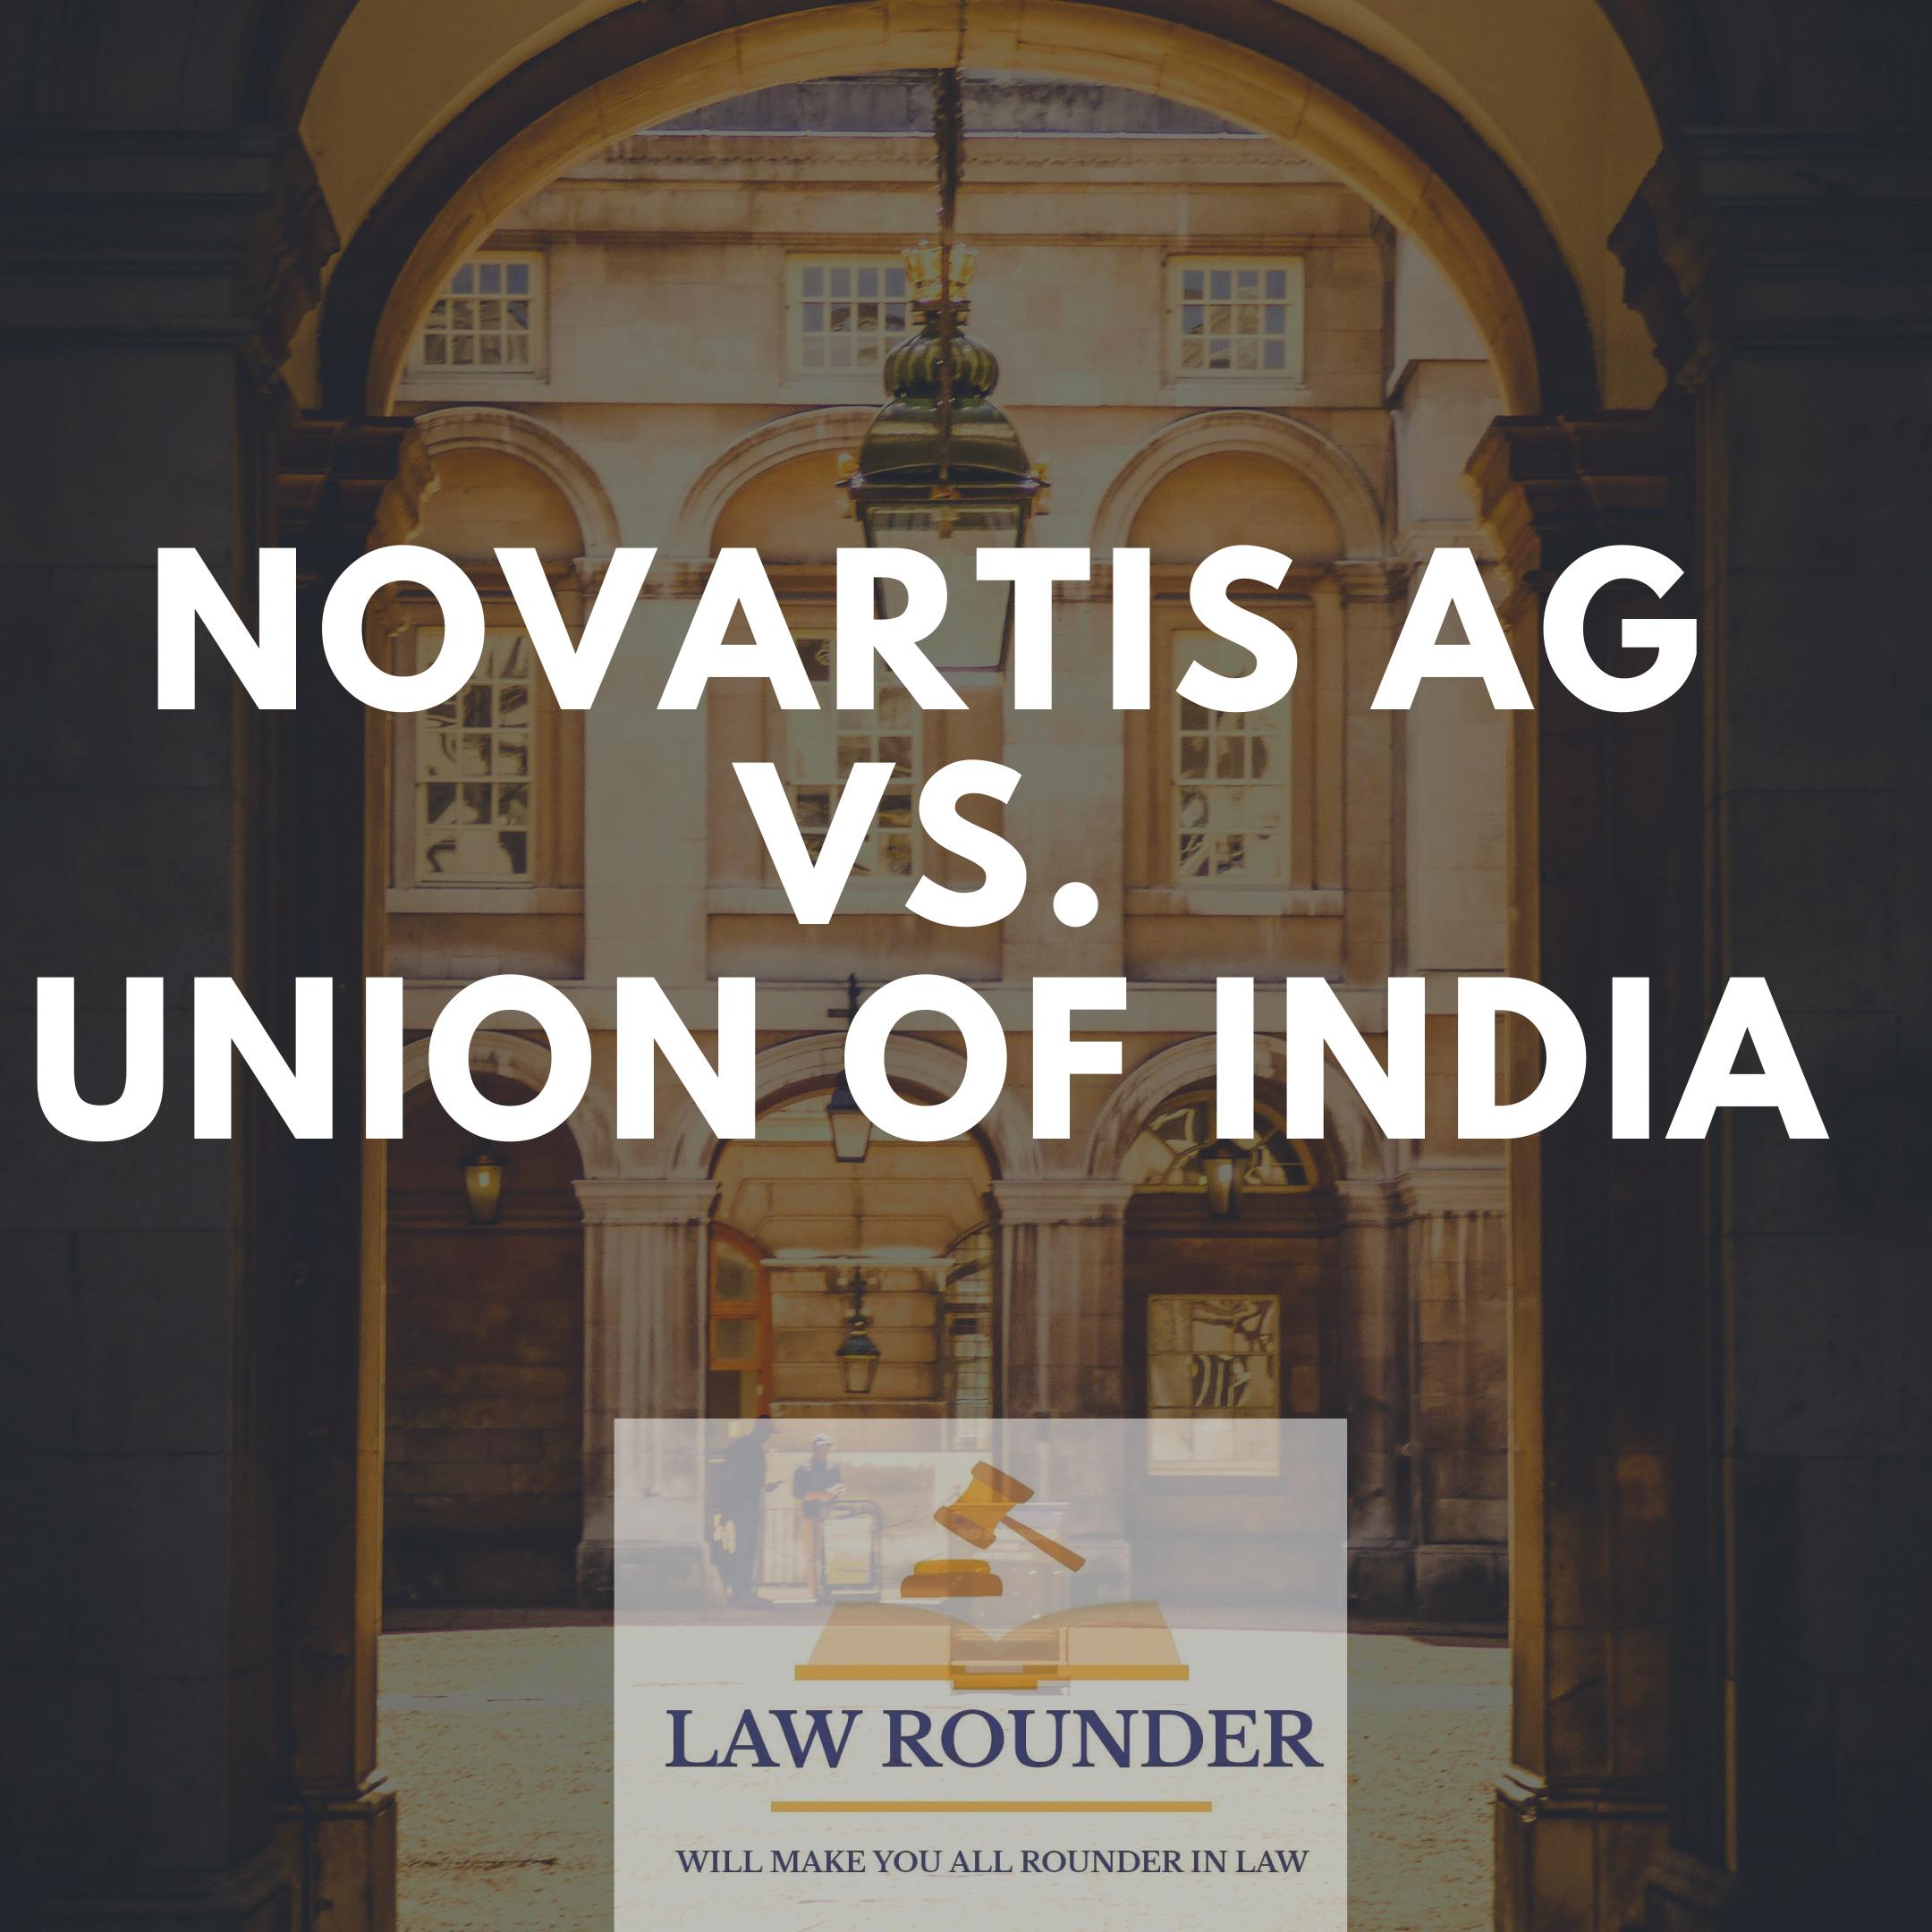 novartis ag vs. union of india